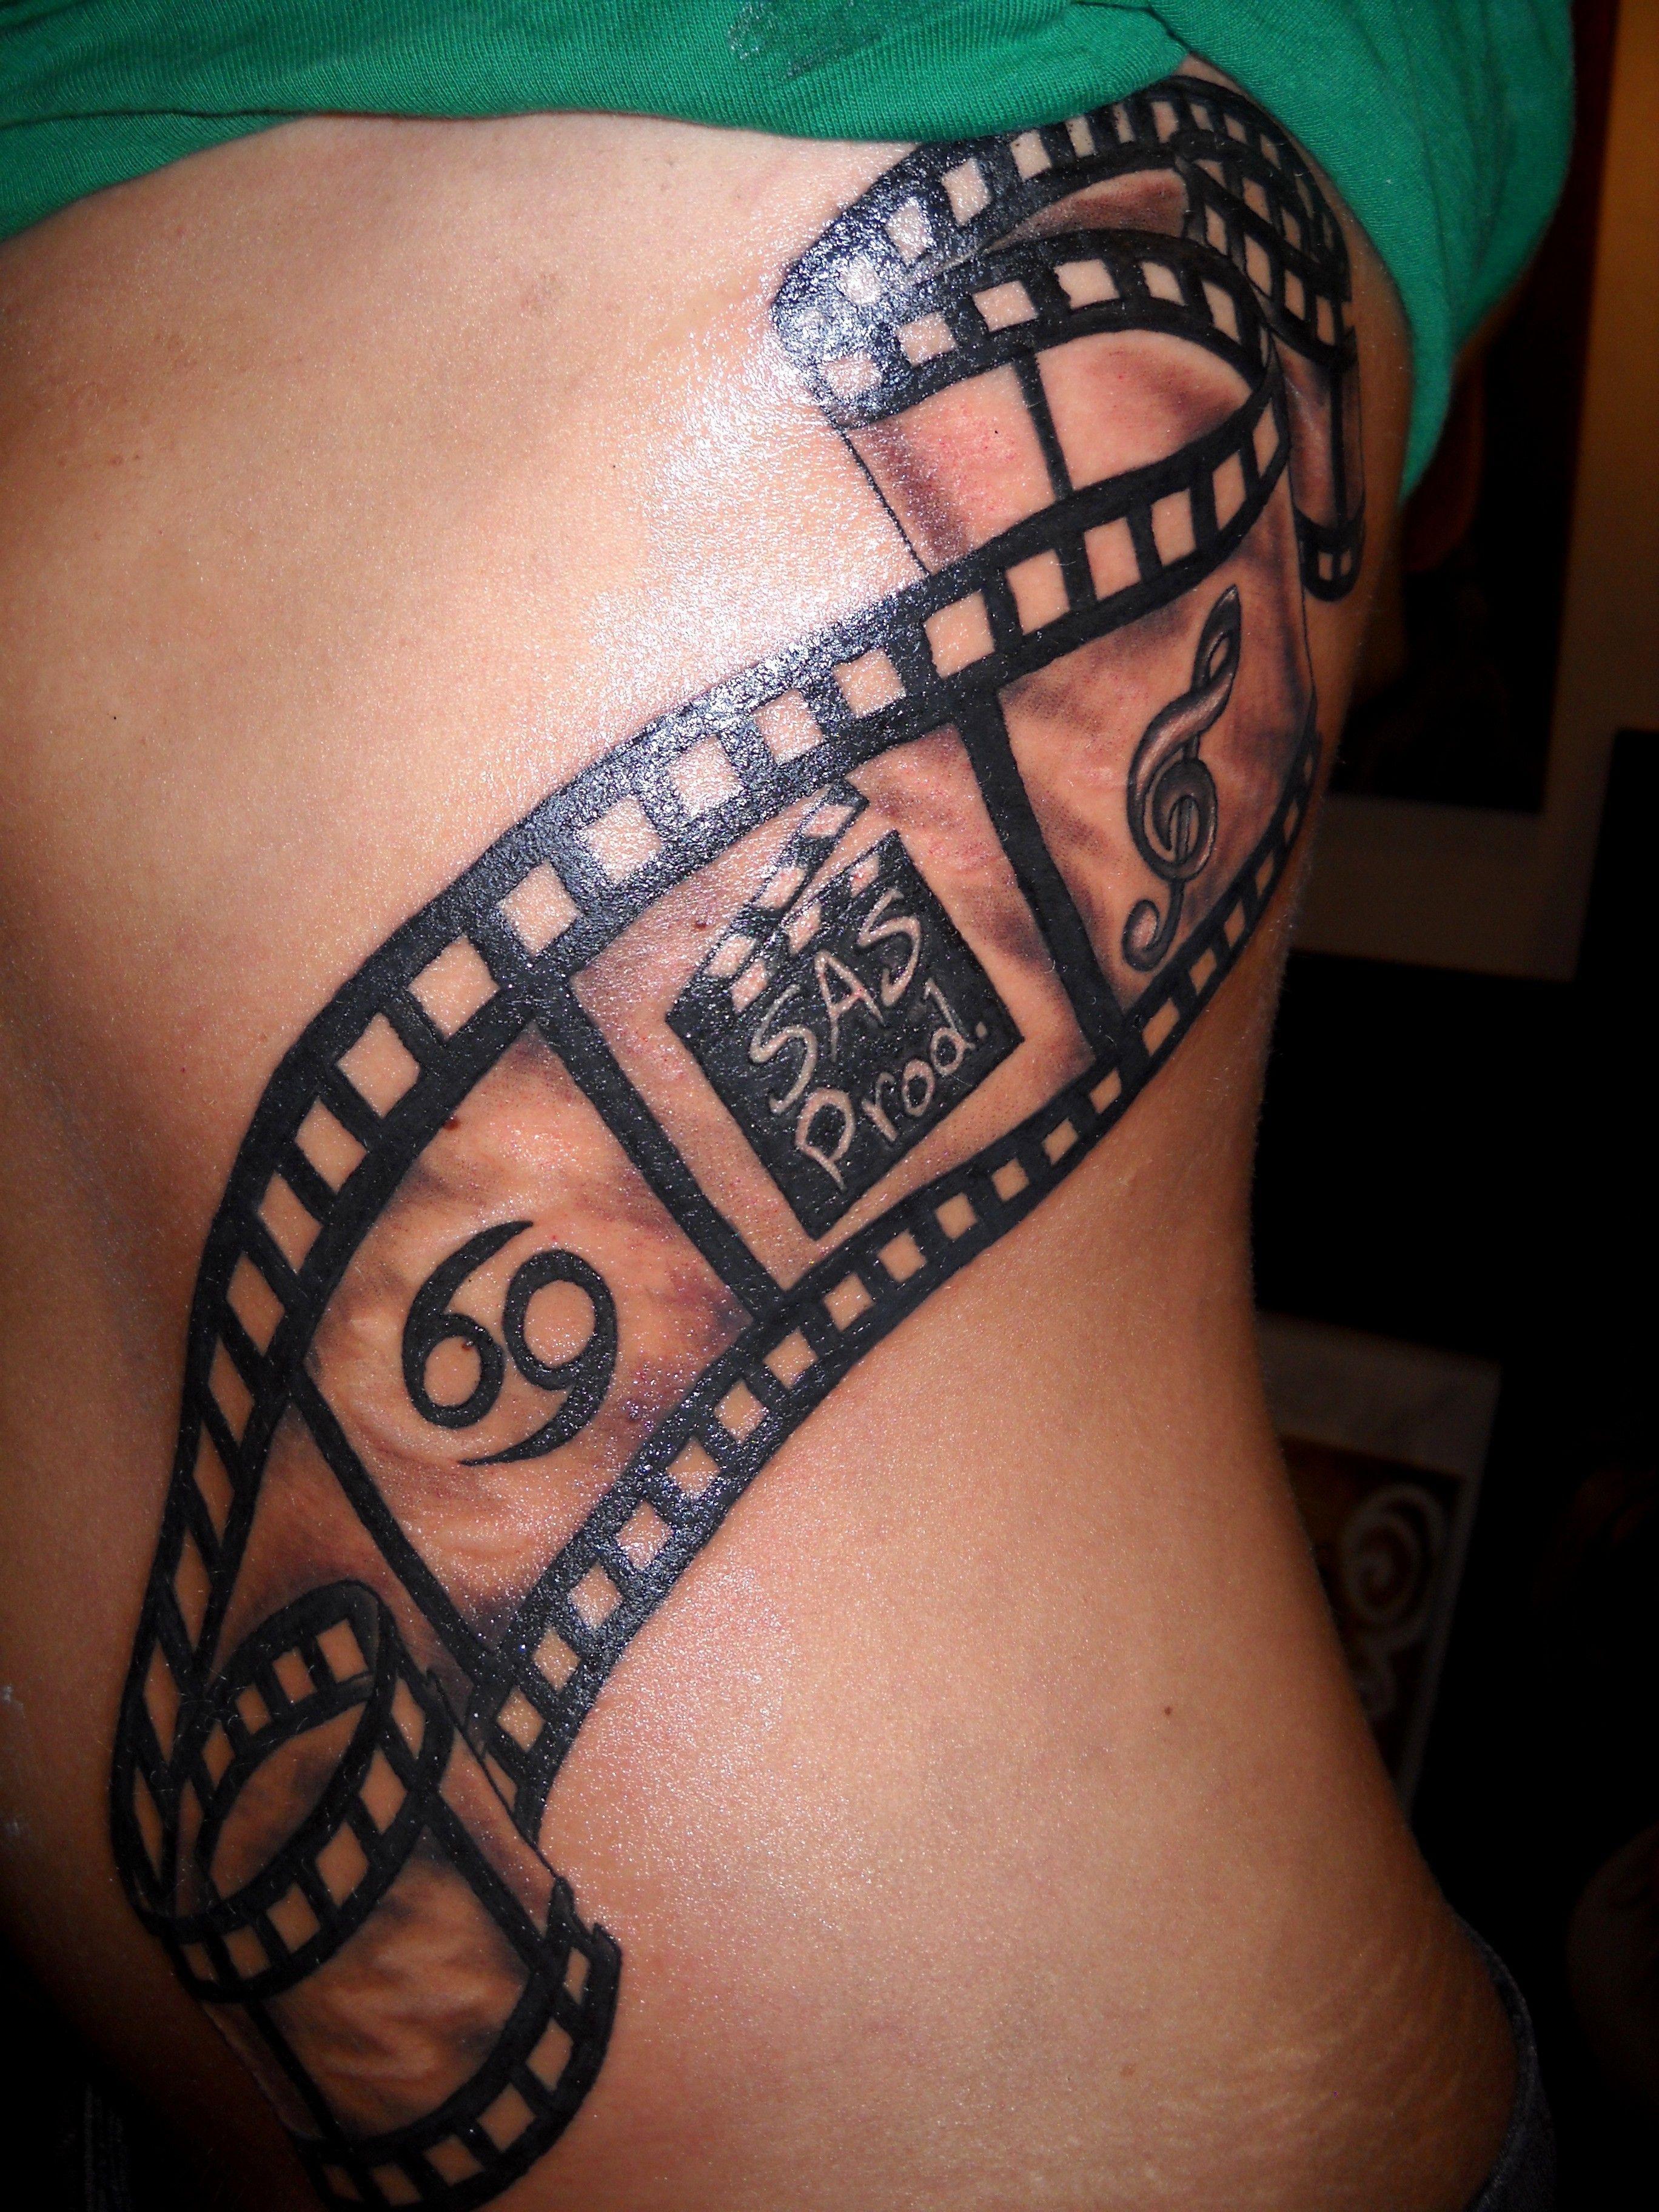 film strip tattoos wallpapers. Black Bedroom Furniture Sets. Home Design Ideas